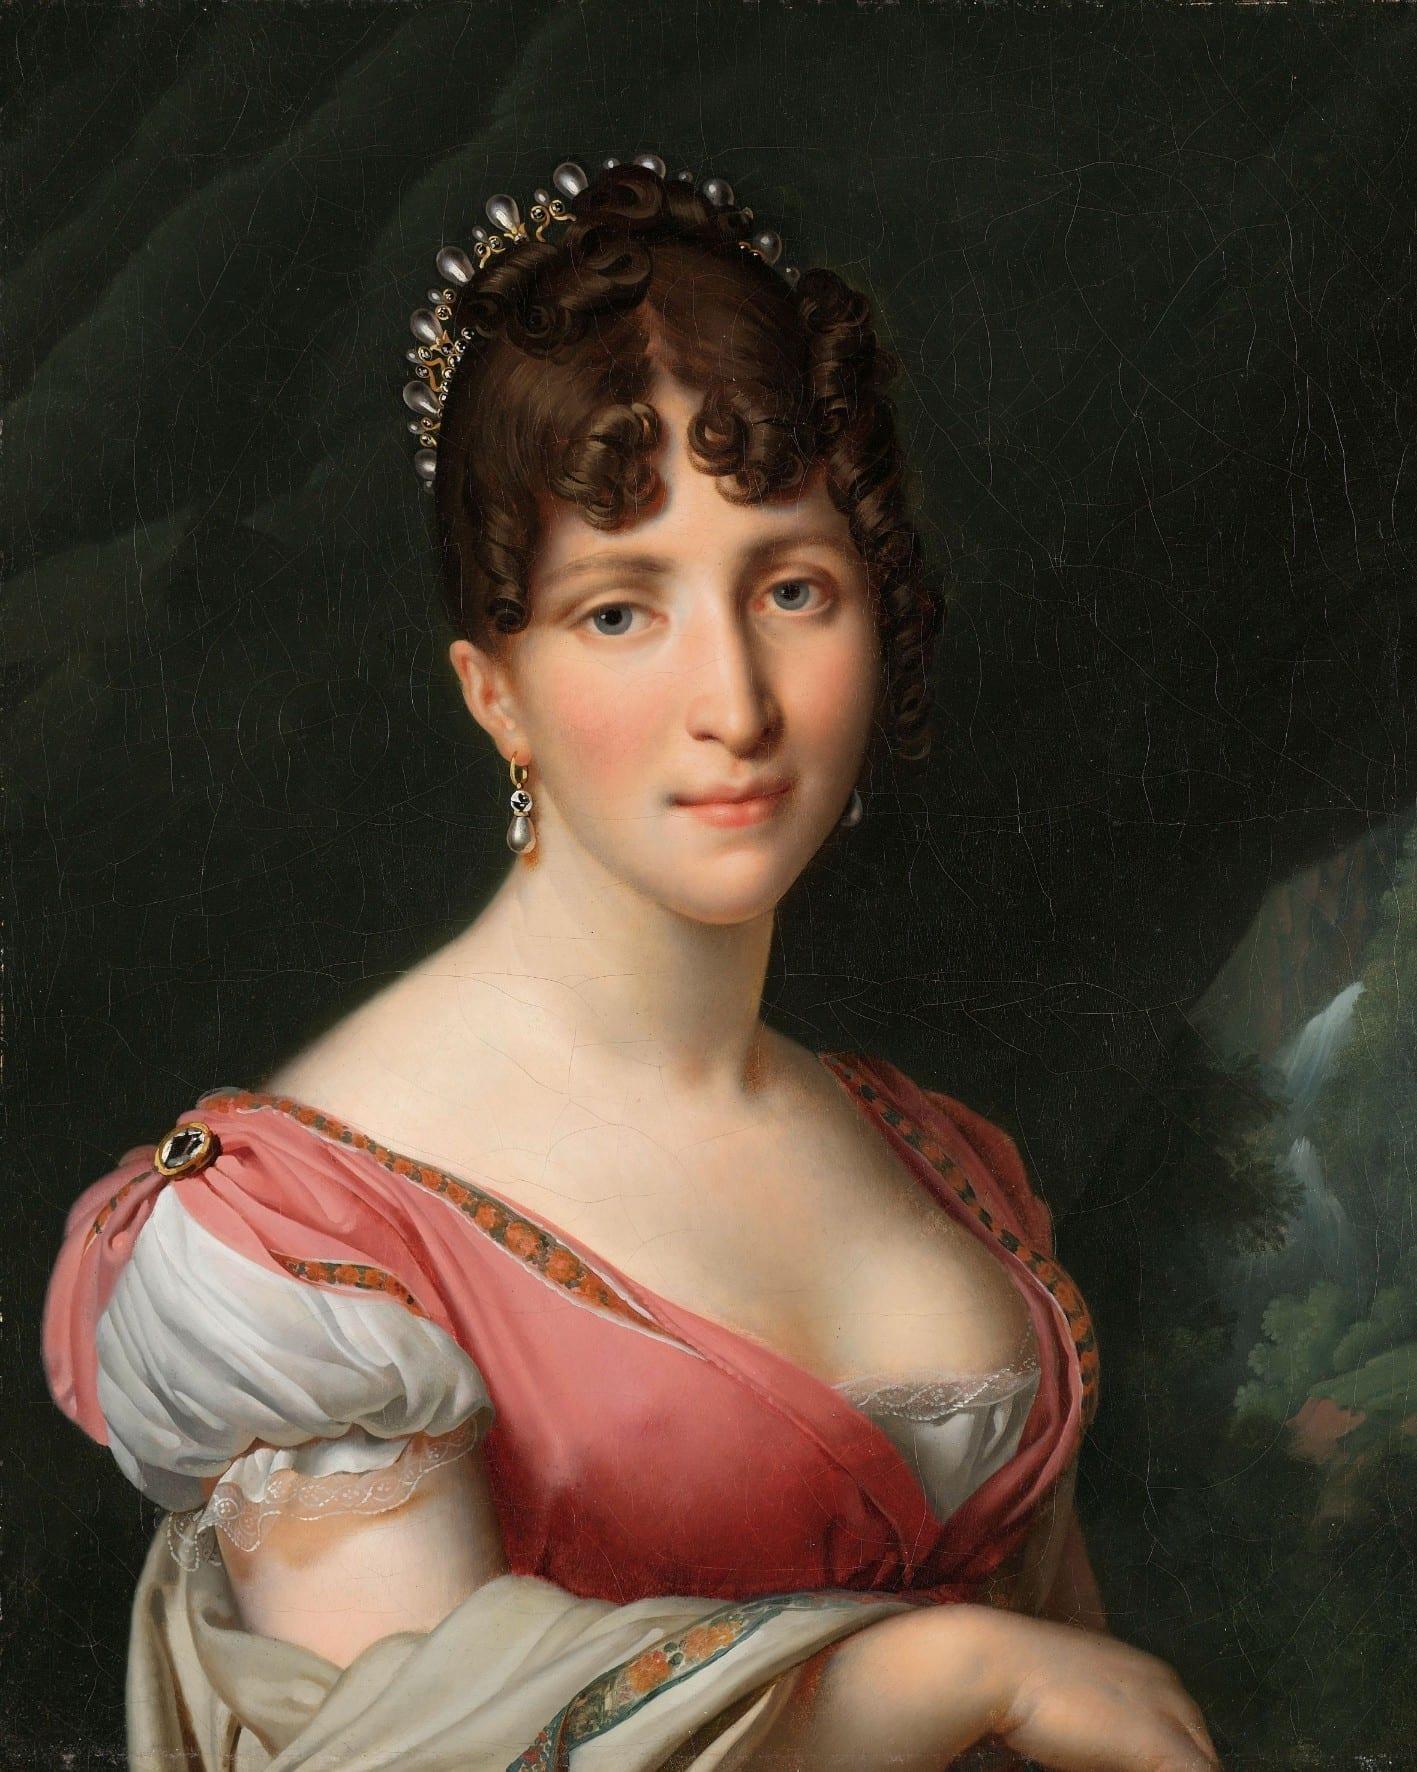 Portret van Hortense de Beauharnais, koningin van Holland - Anne-Louis Girodet-Trioson